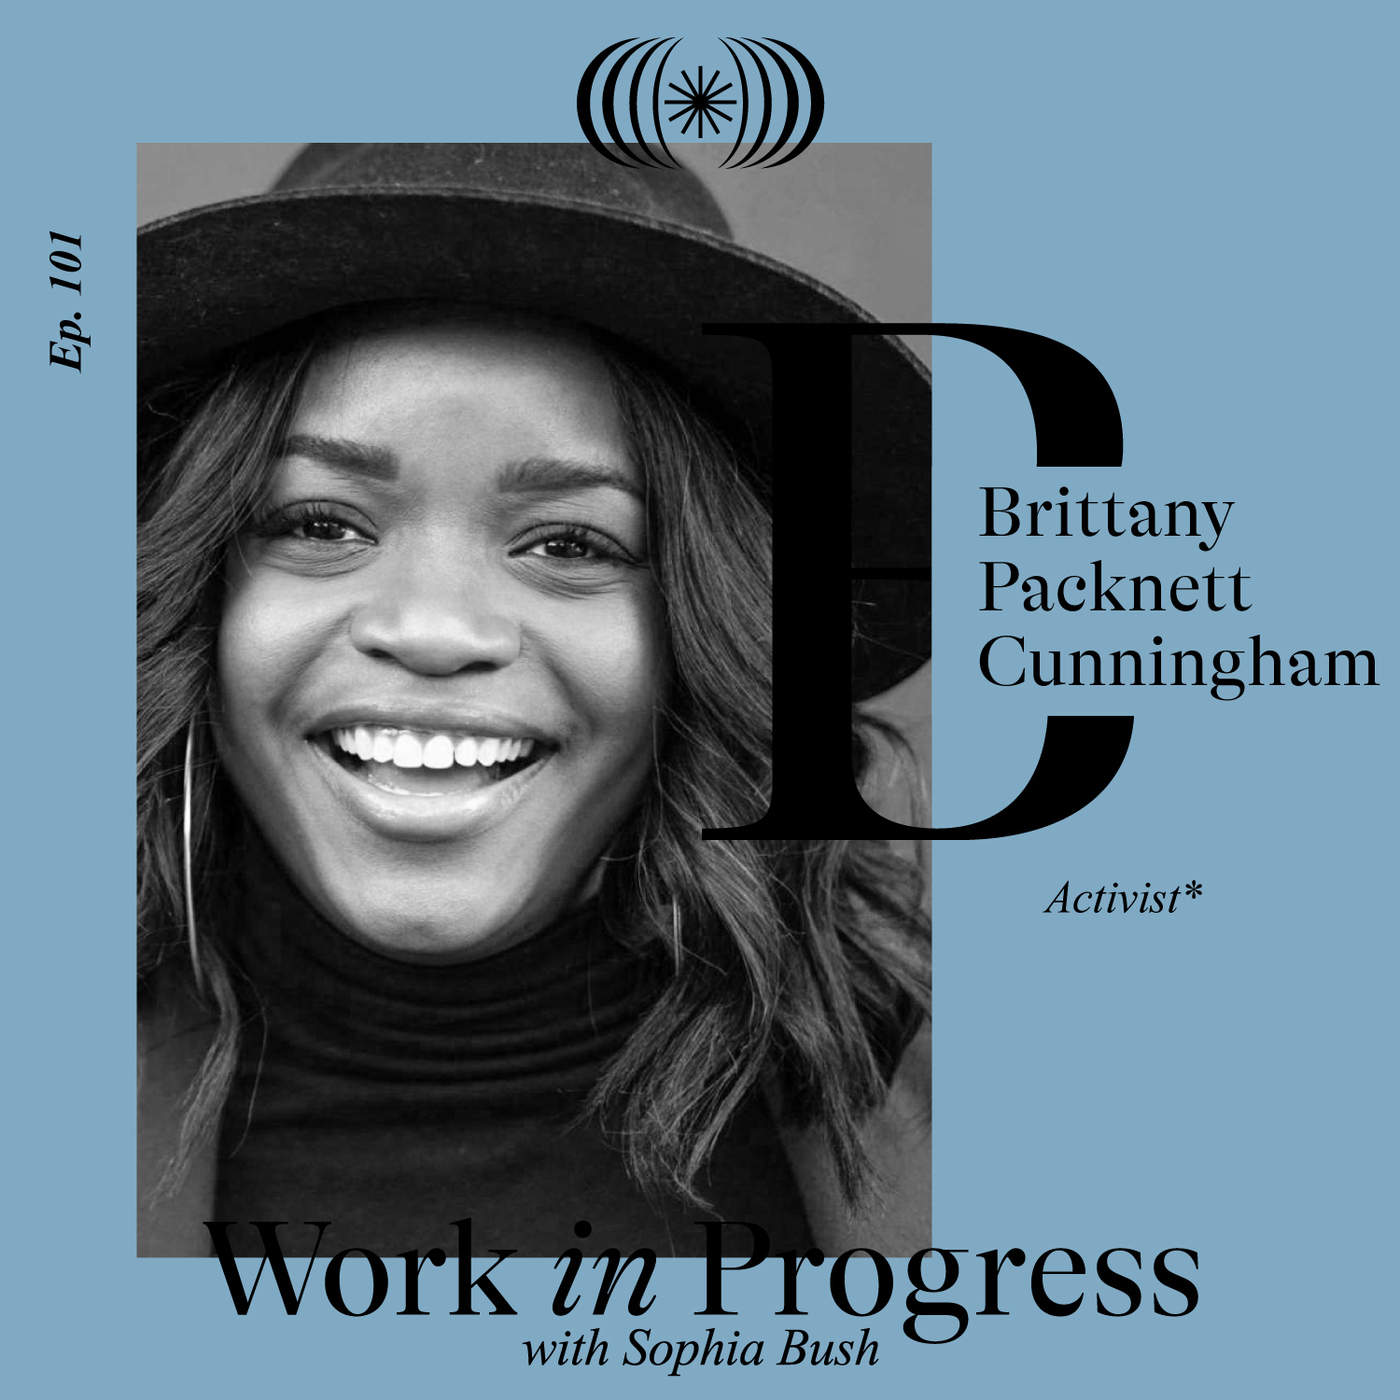 Brittany Packnett Cunningham